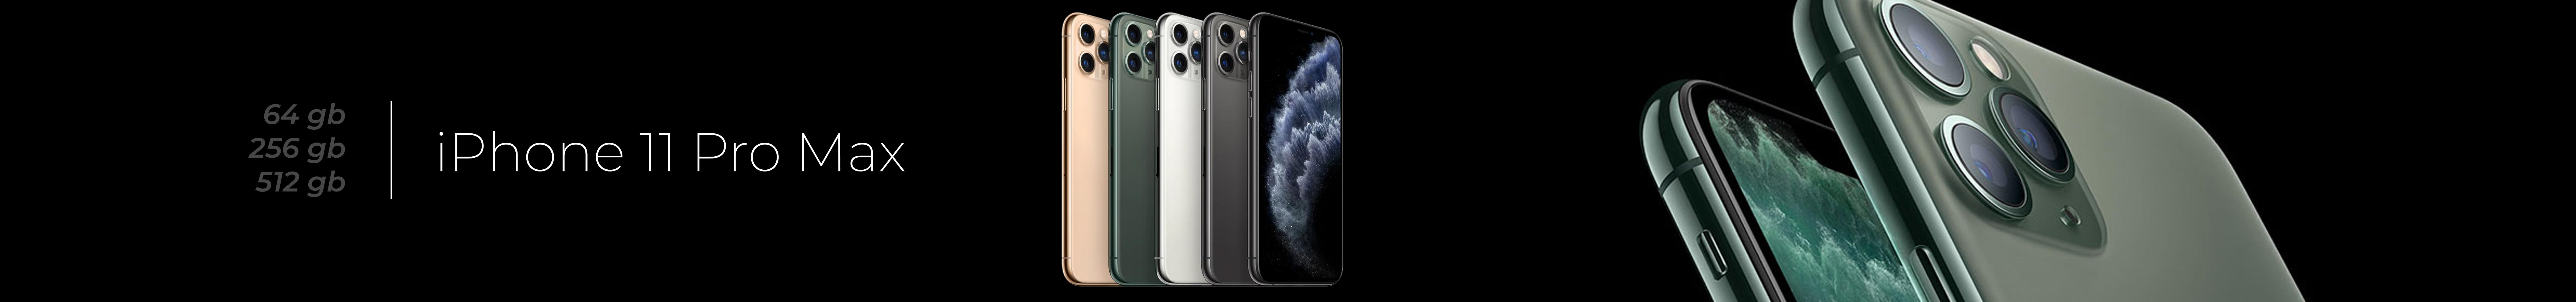 iPhone 11 Pro Max Open Box Mobile